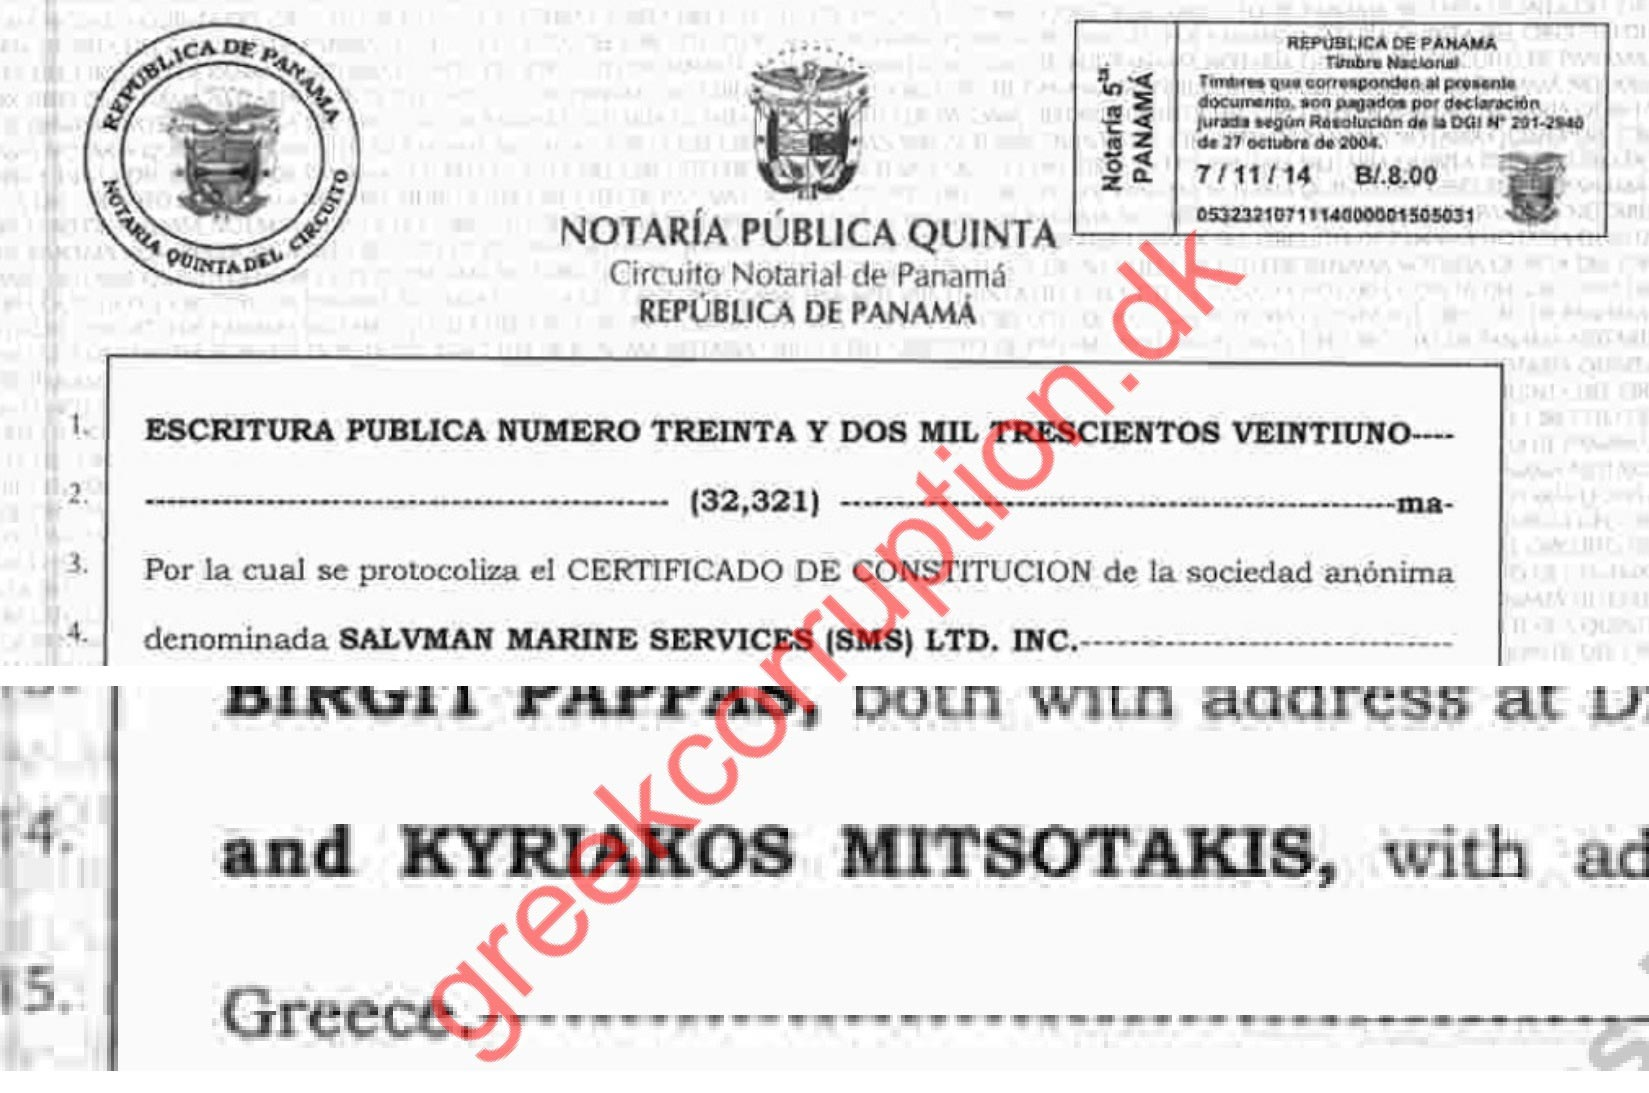 Kyriakos Mitsotakis, Offshore Company in Panama.